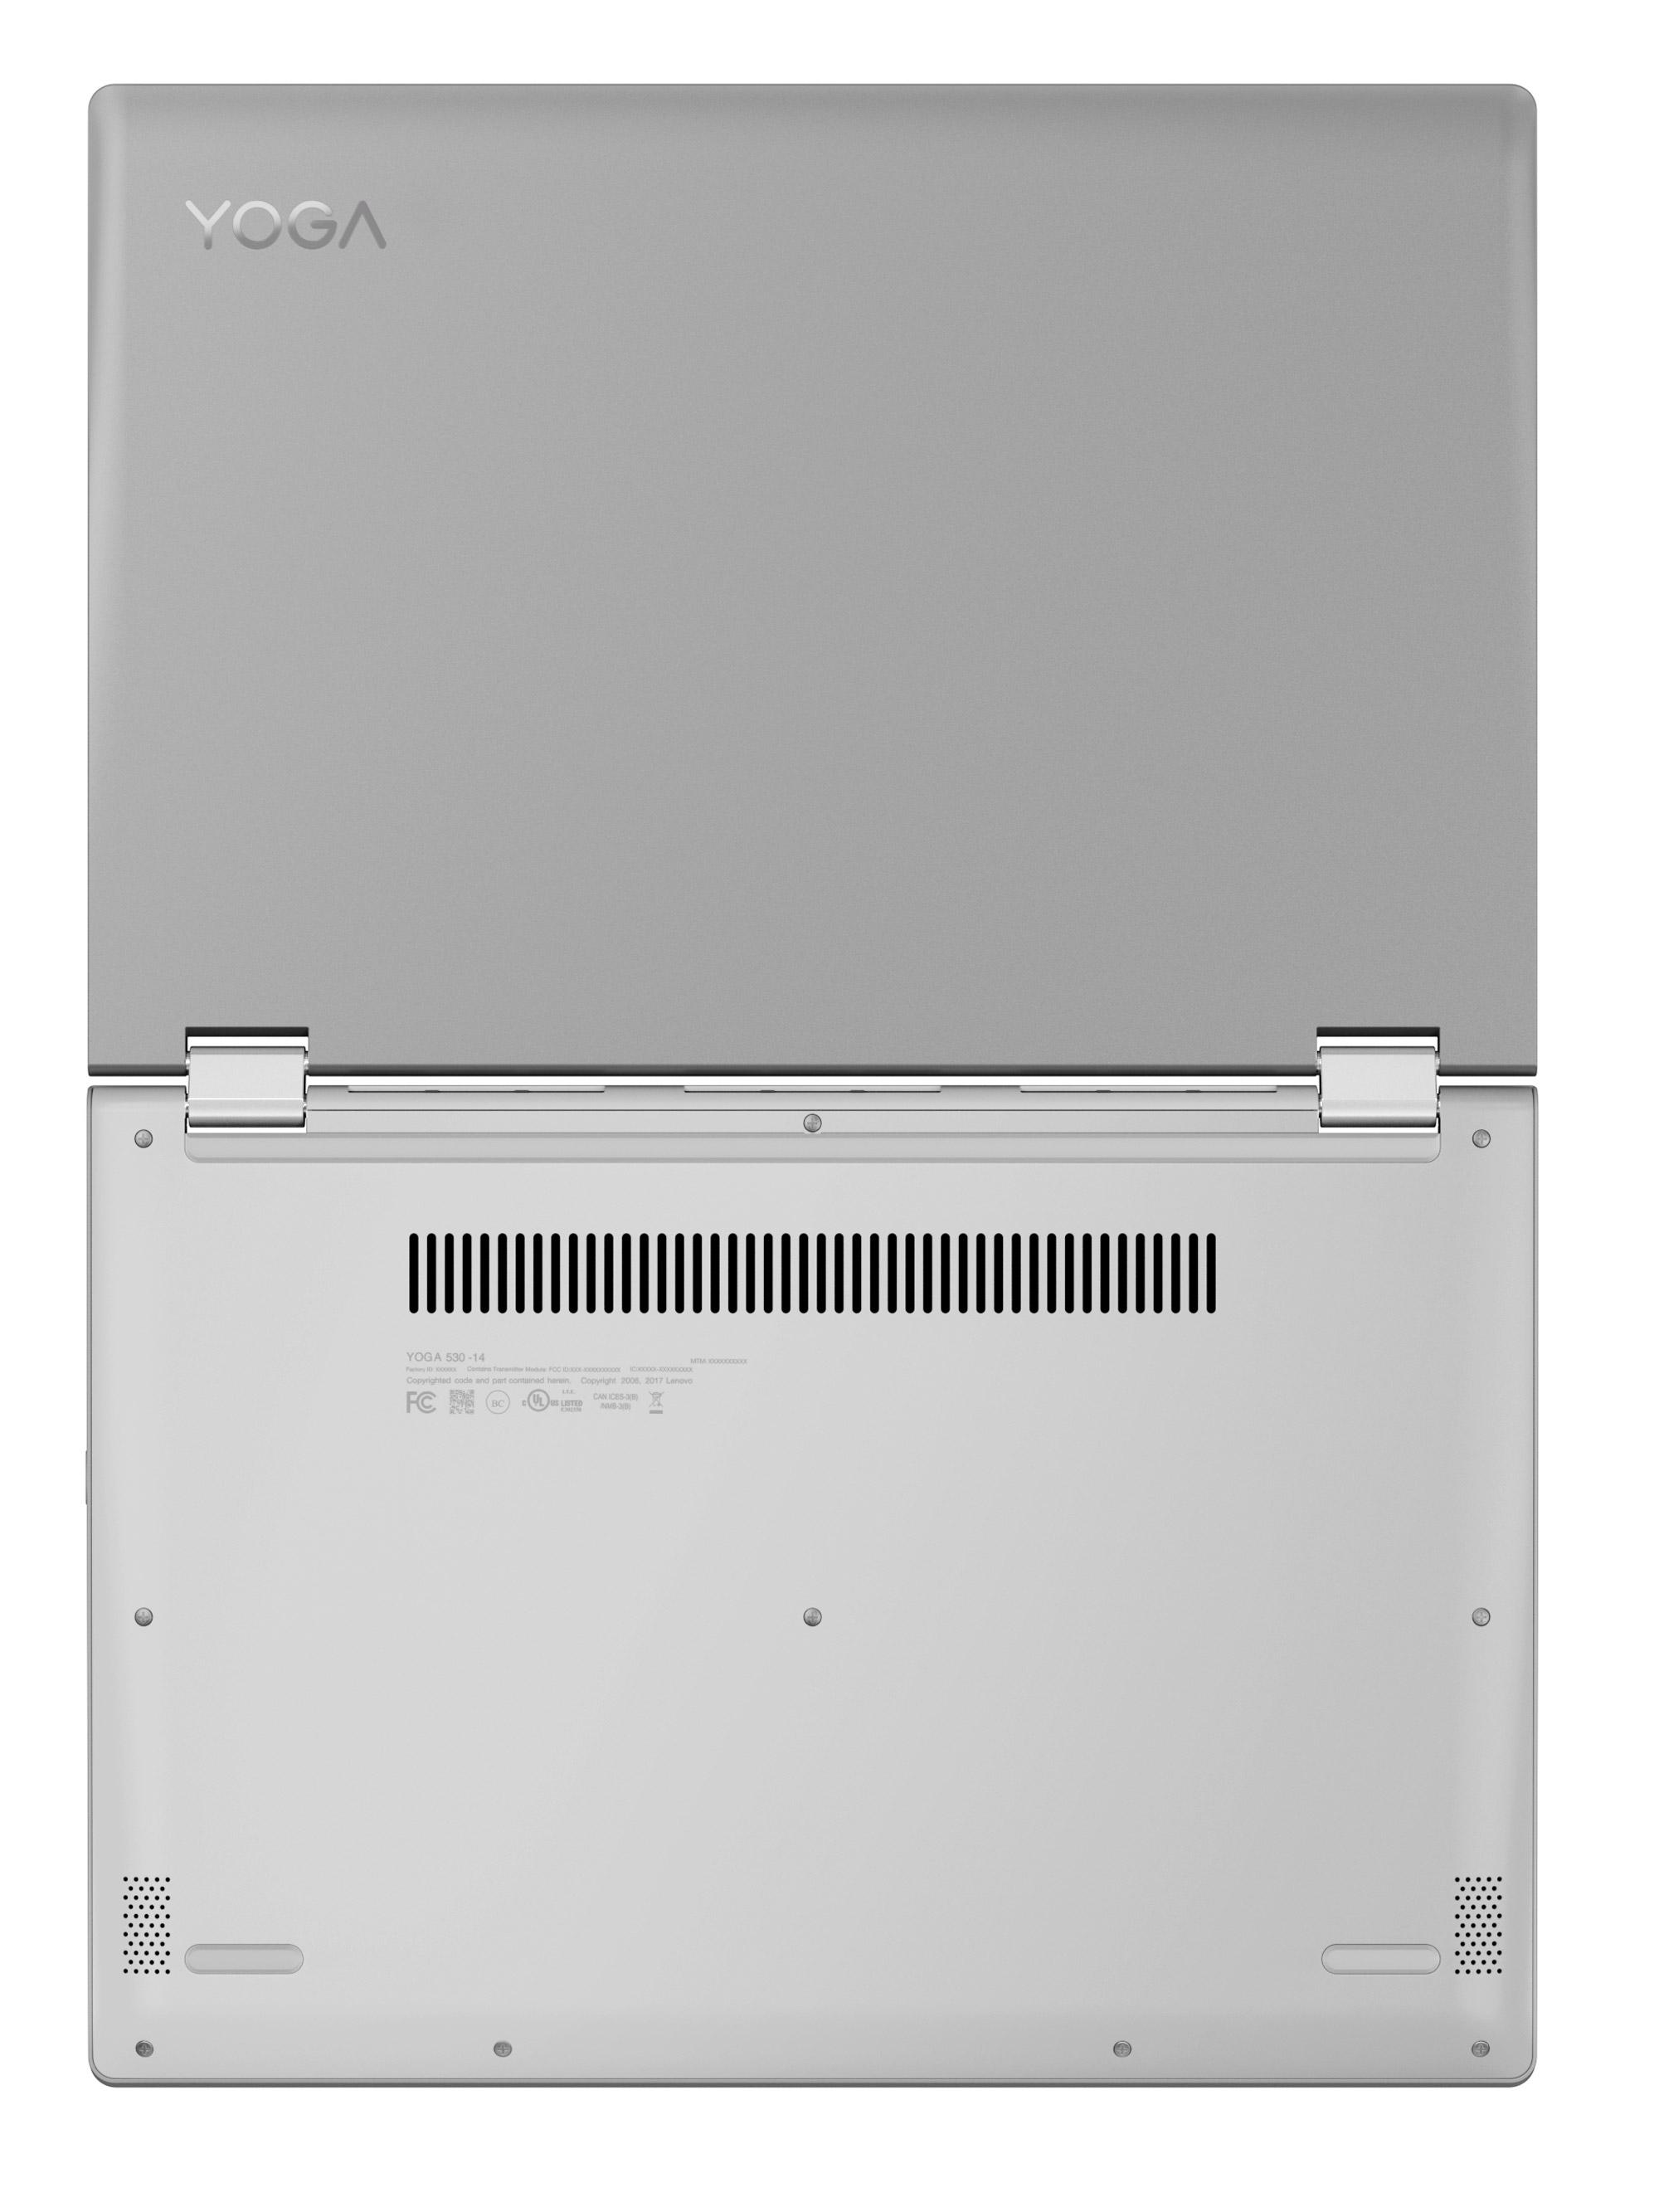 Фото  Ультрабук Lenovo Yoga 530-14IKB Mineral Grey (81EK016QRU)